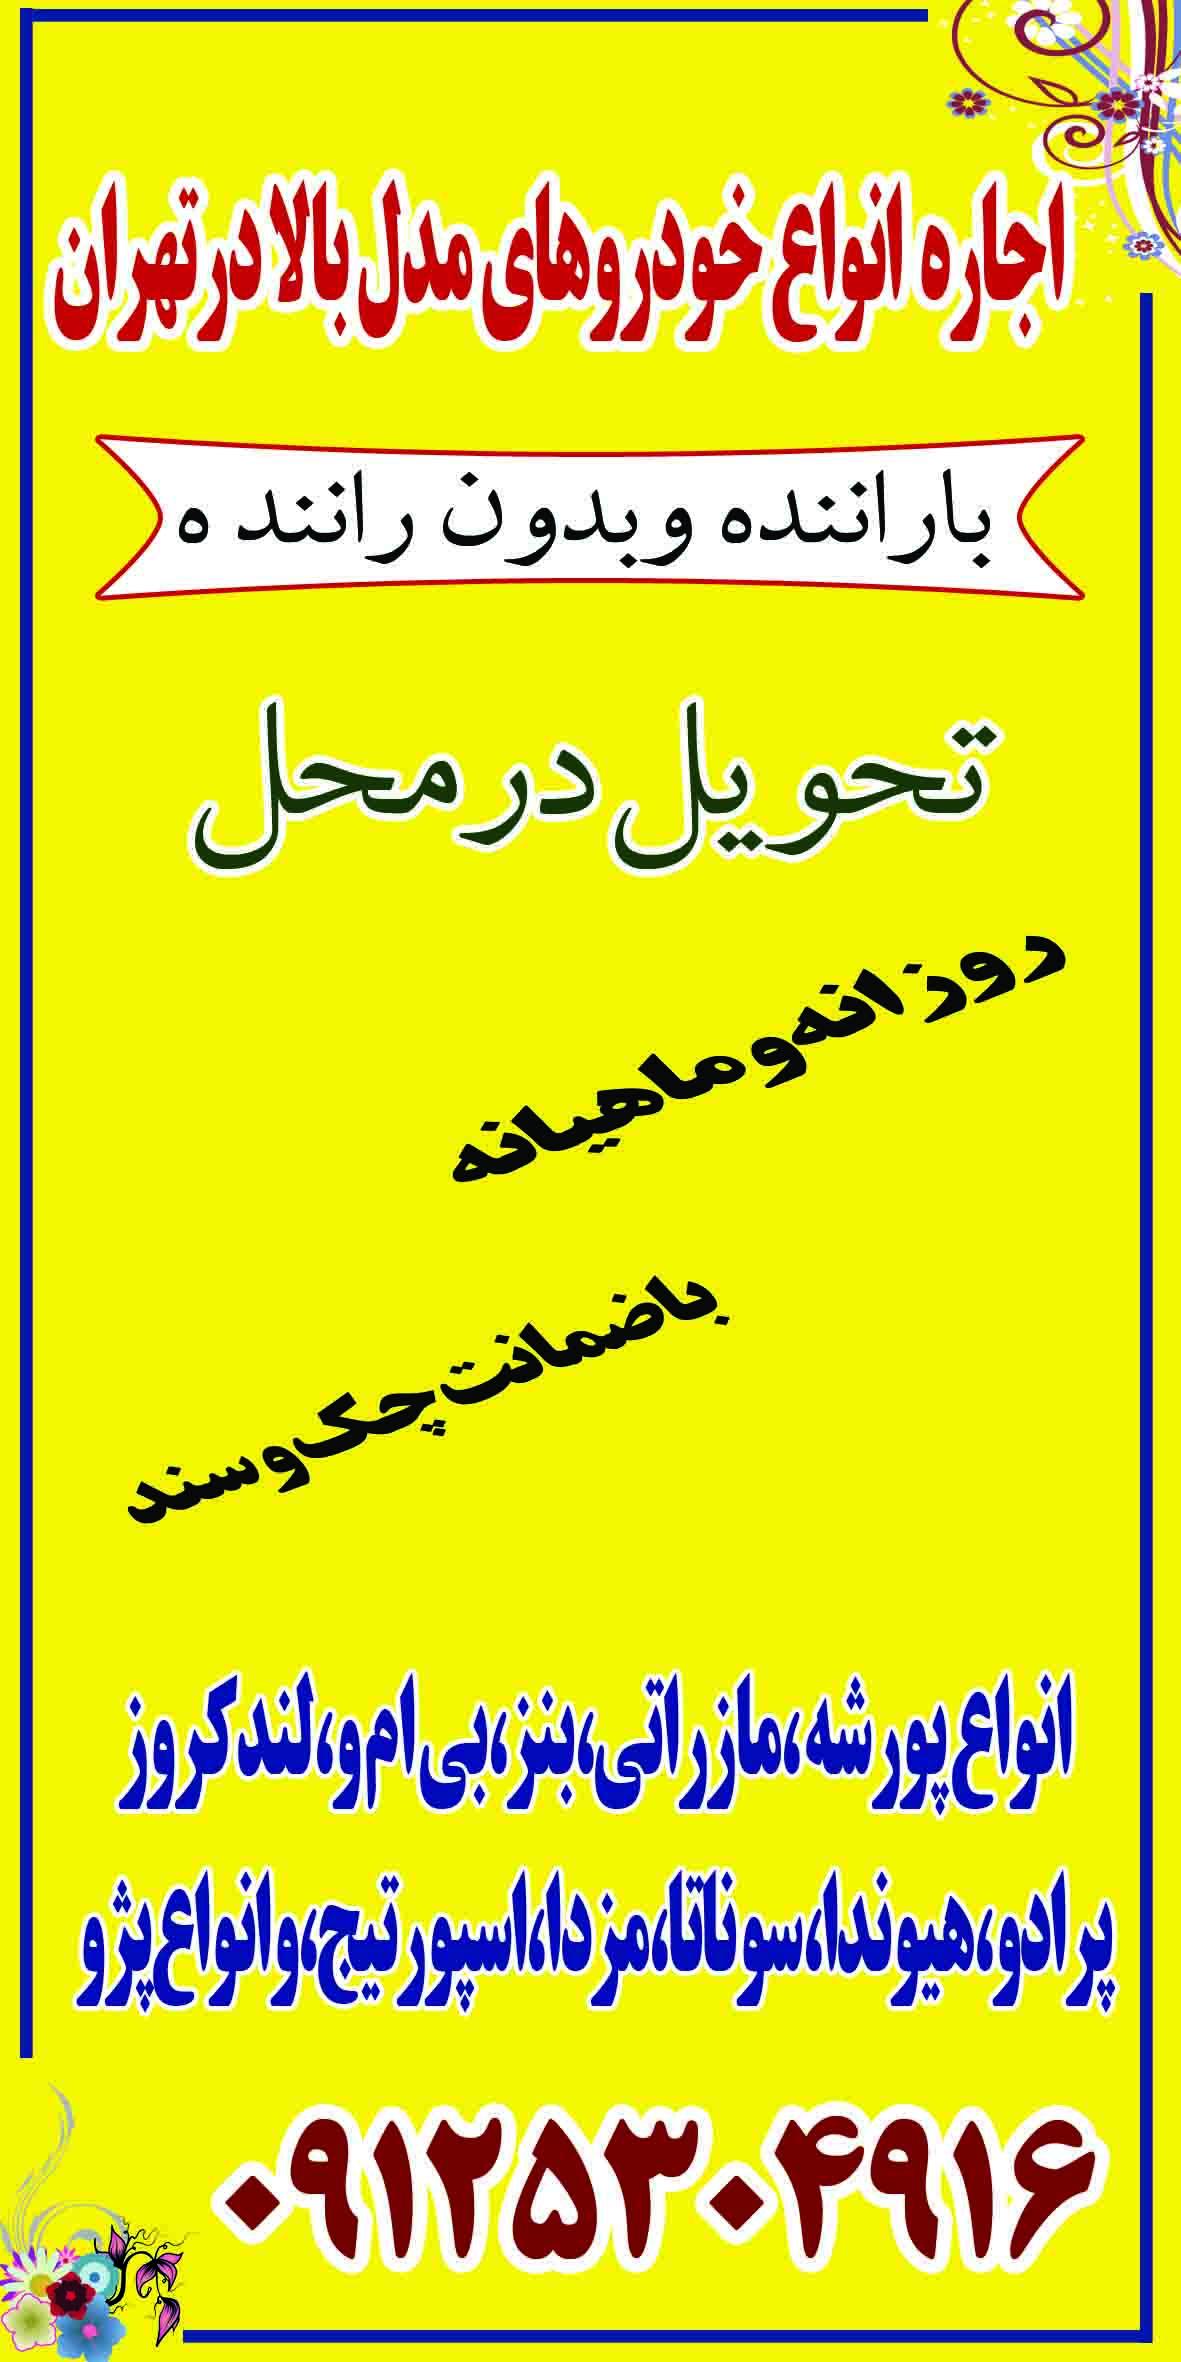 tehran (5)